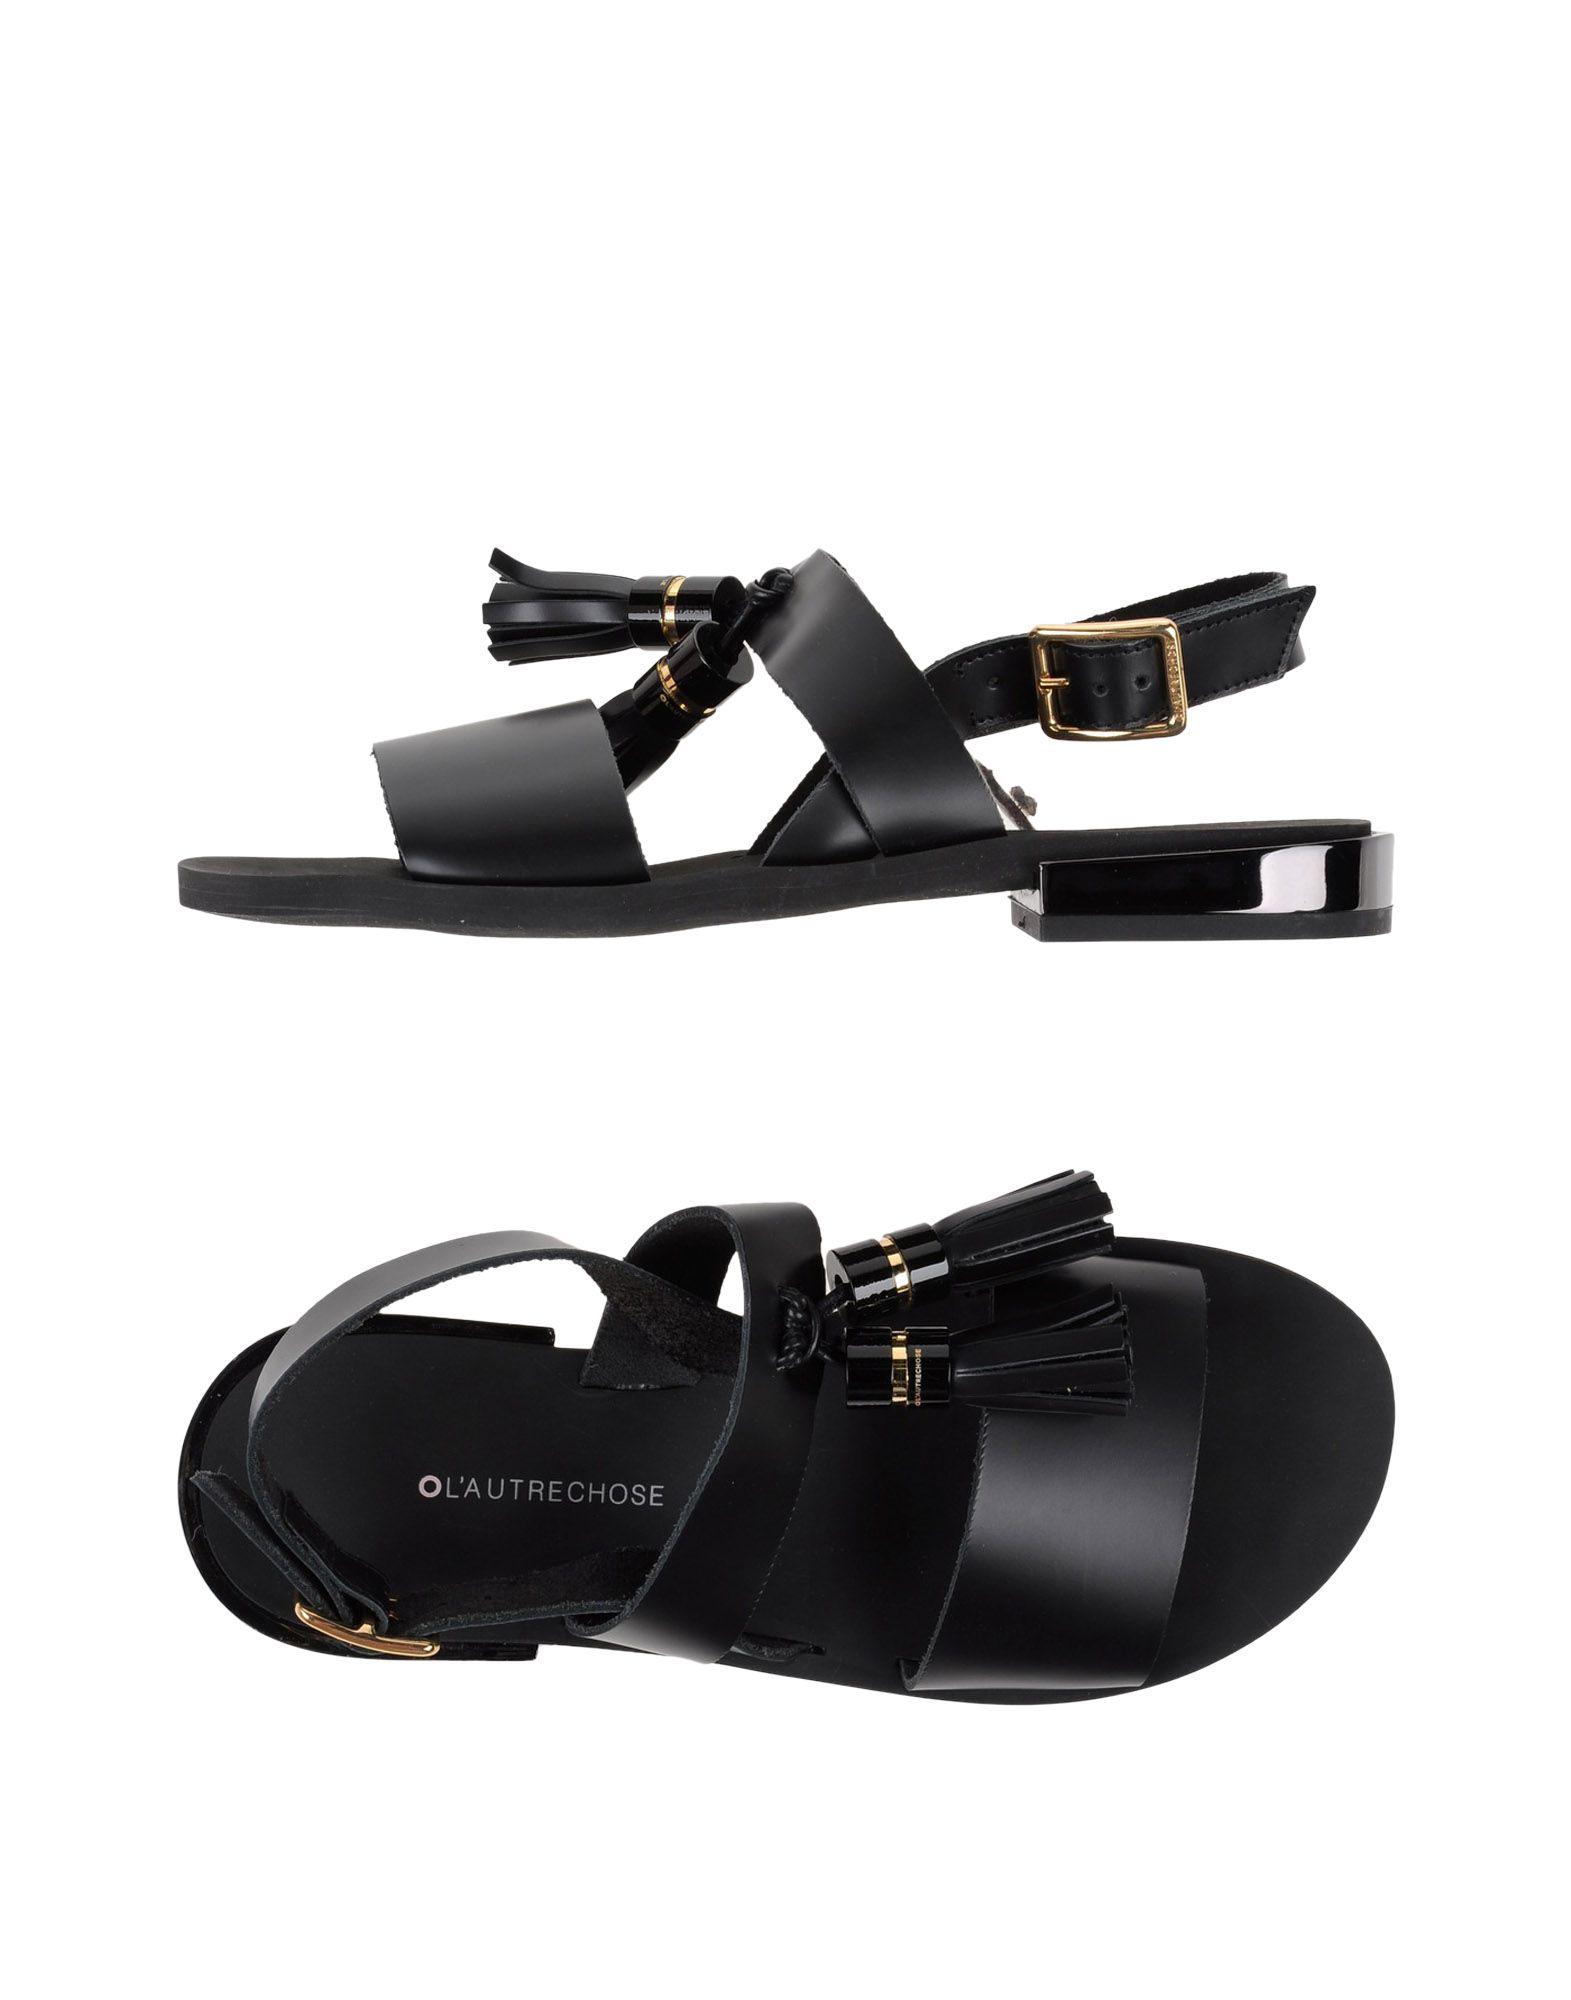 L' L' L' Autre Chose Sandalen Damen  11134587KQ Neue Schuhe 3b1687